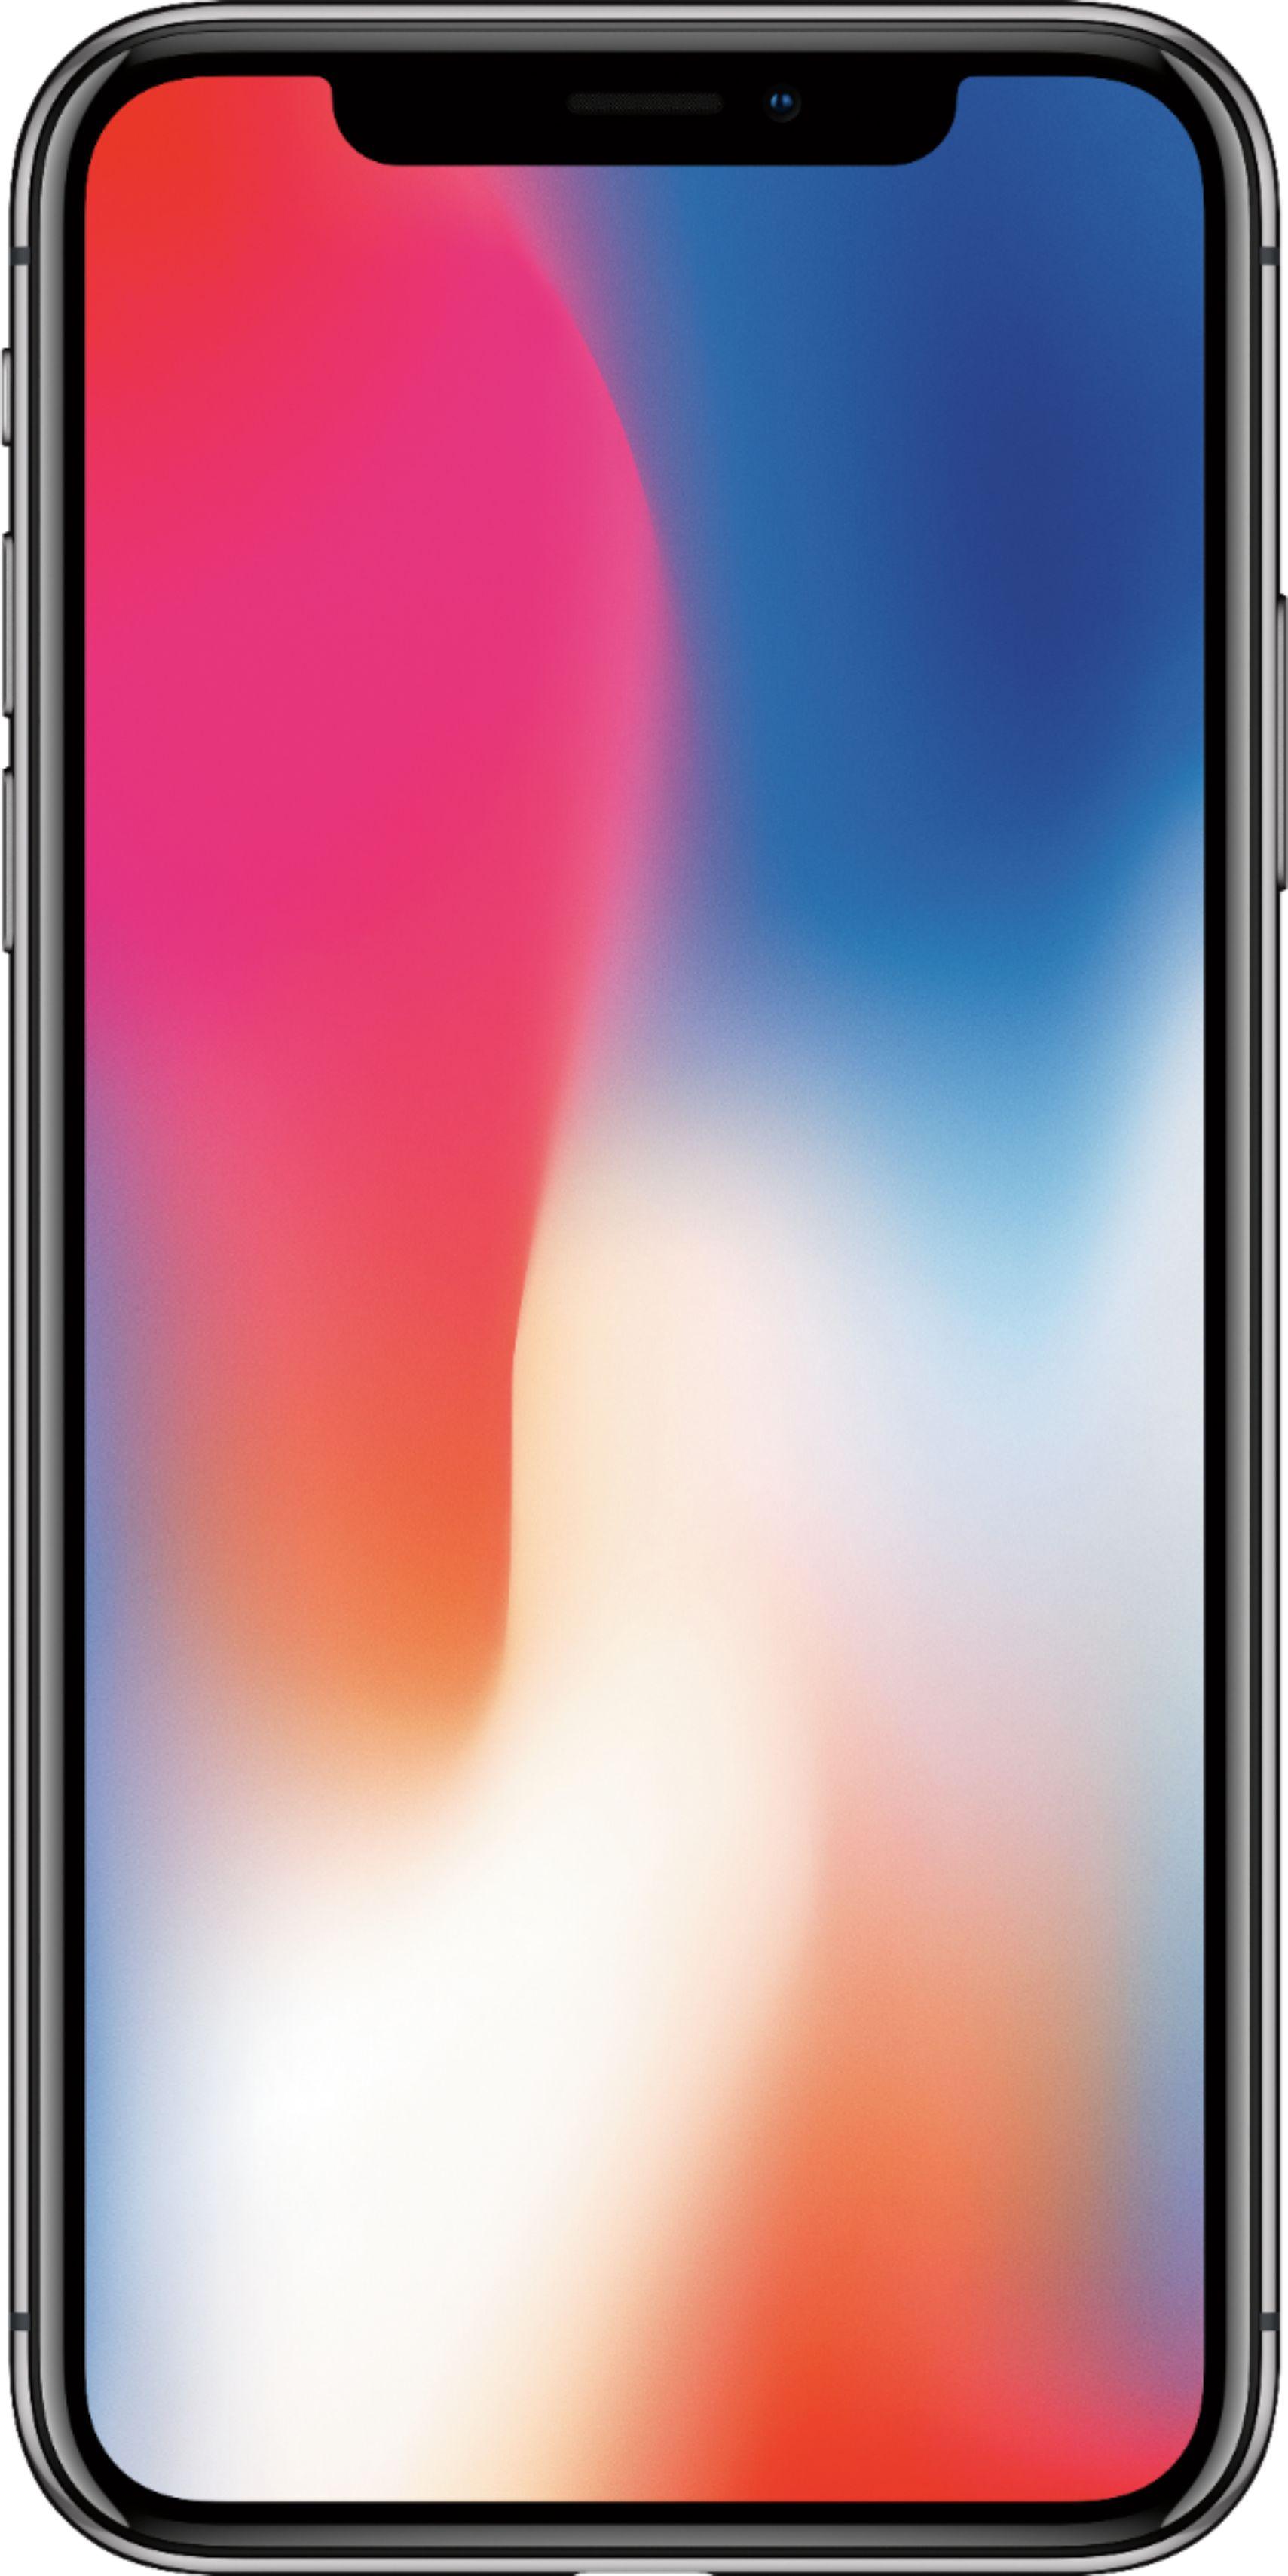 Apple iPhone X 64GB Space Gray Sprint MQA52LLA  Best Buy